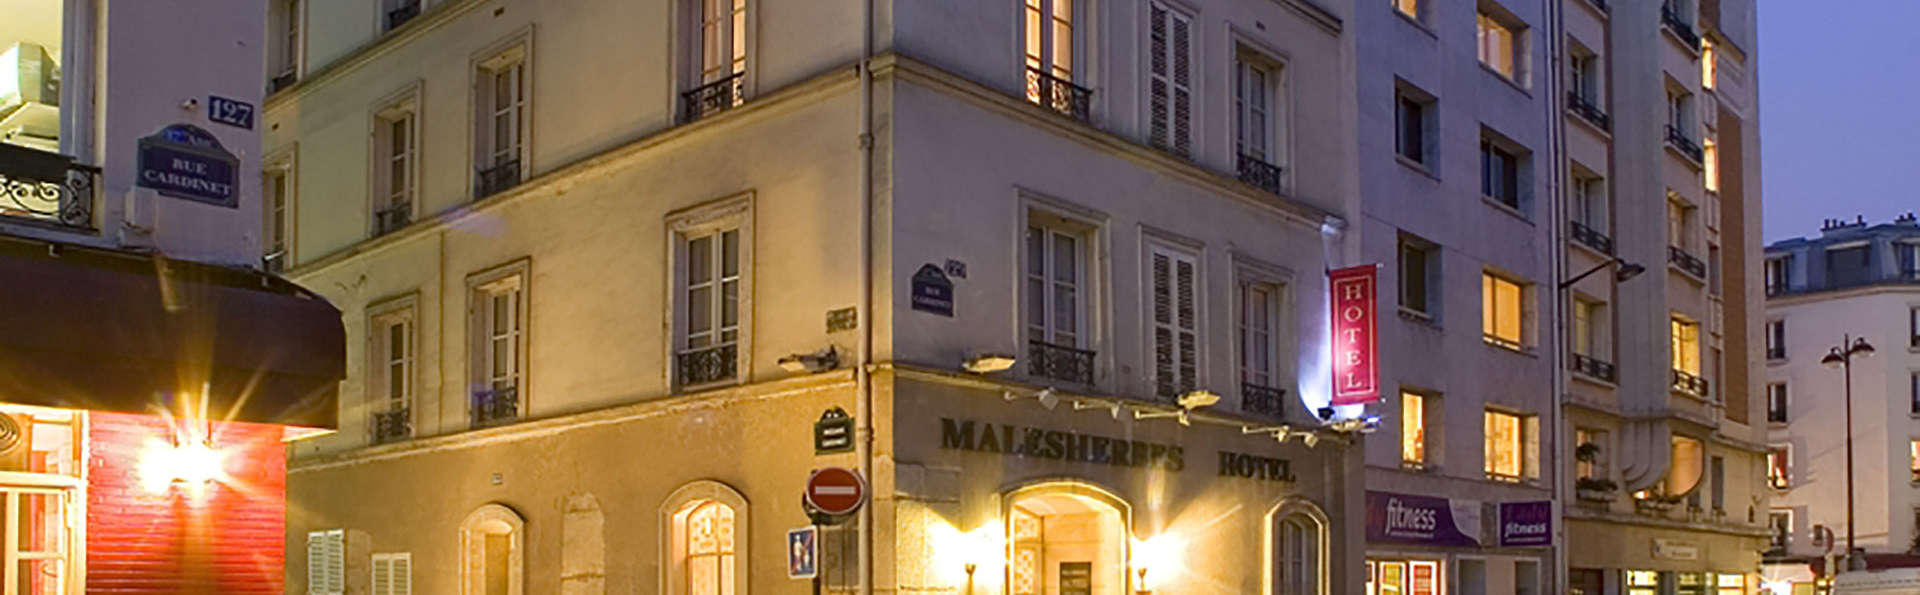 Hôtel Romance Malesherbes - Edit_Front.jpg